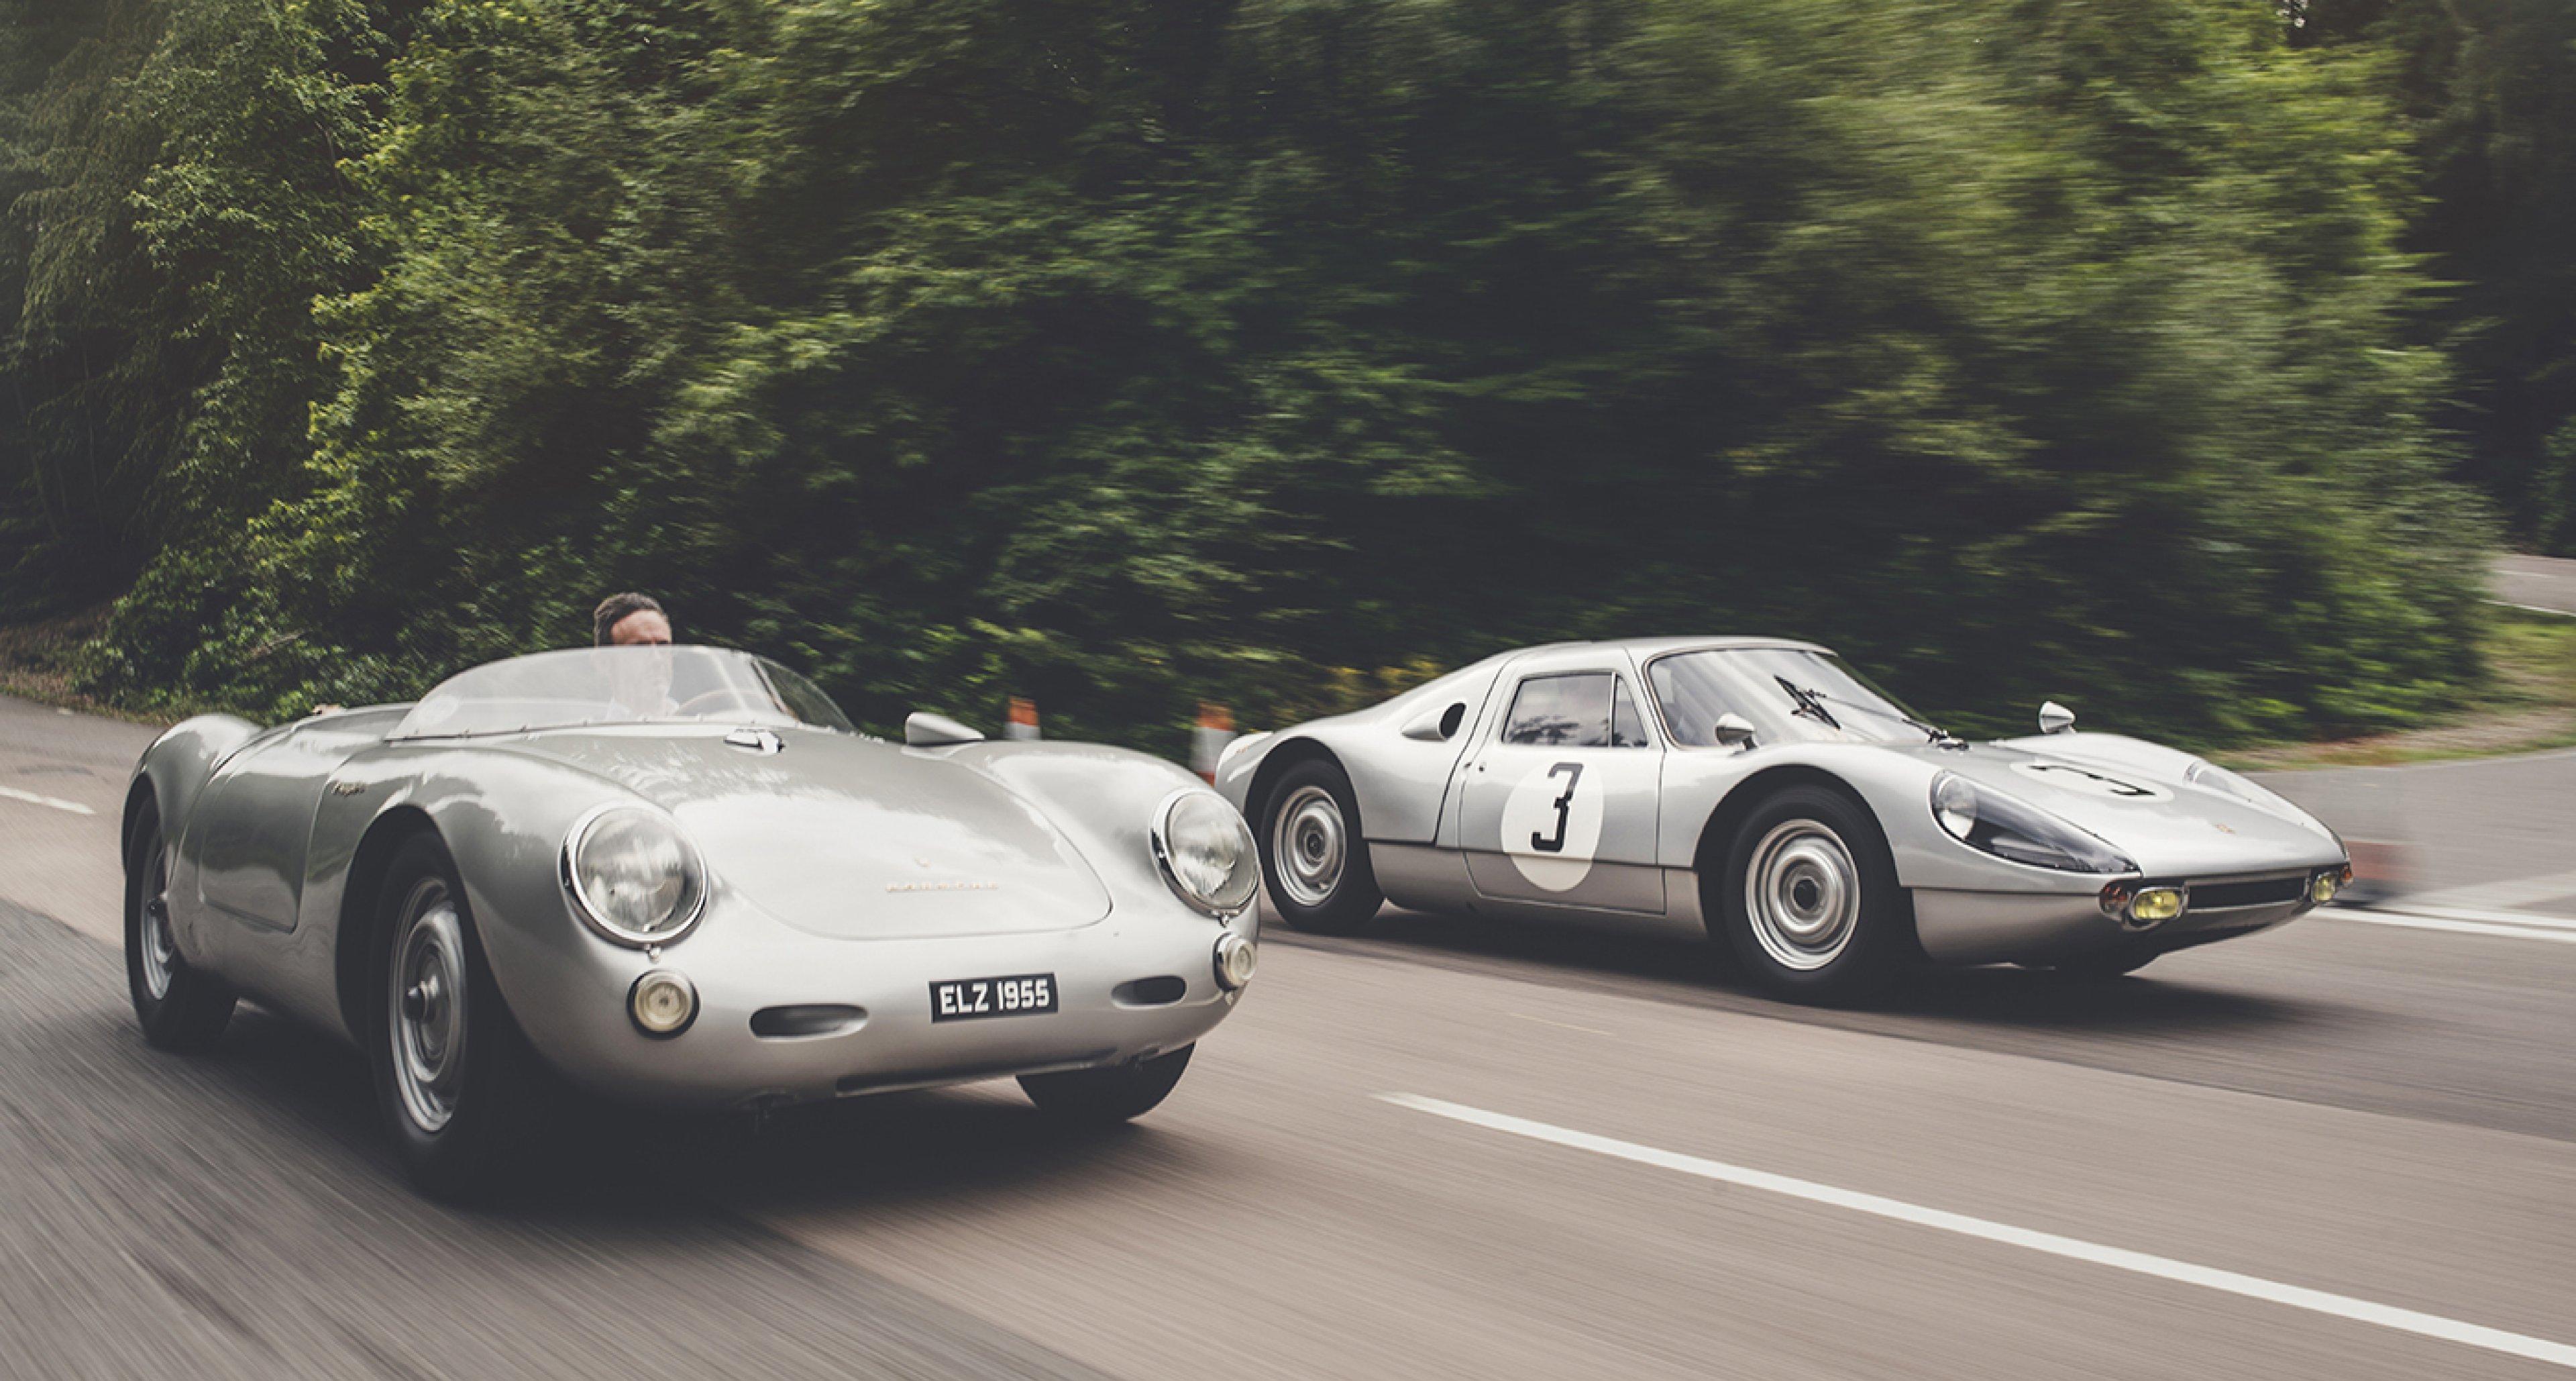 porsches 550 spyder and 904 carrera gts deliver primitive perfection classic driver magazine - Porsche Spyder 550 2014